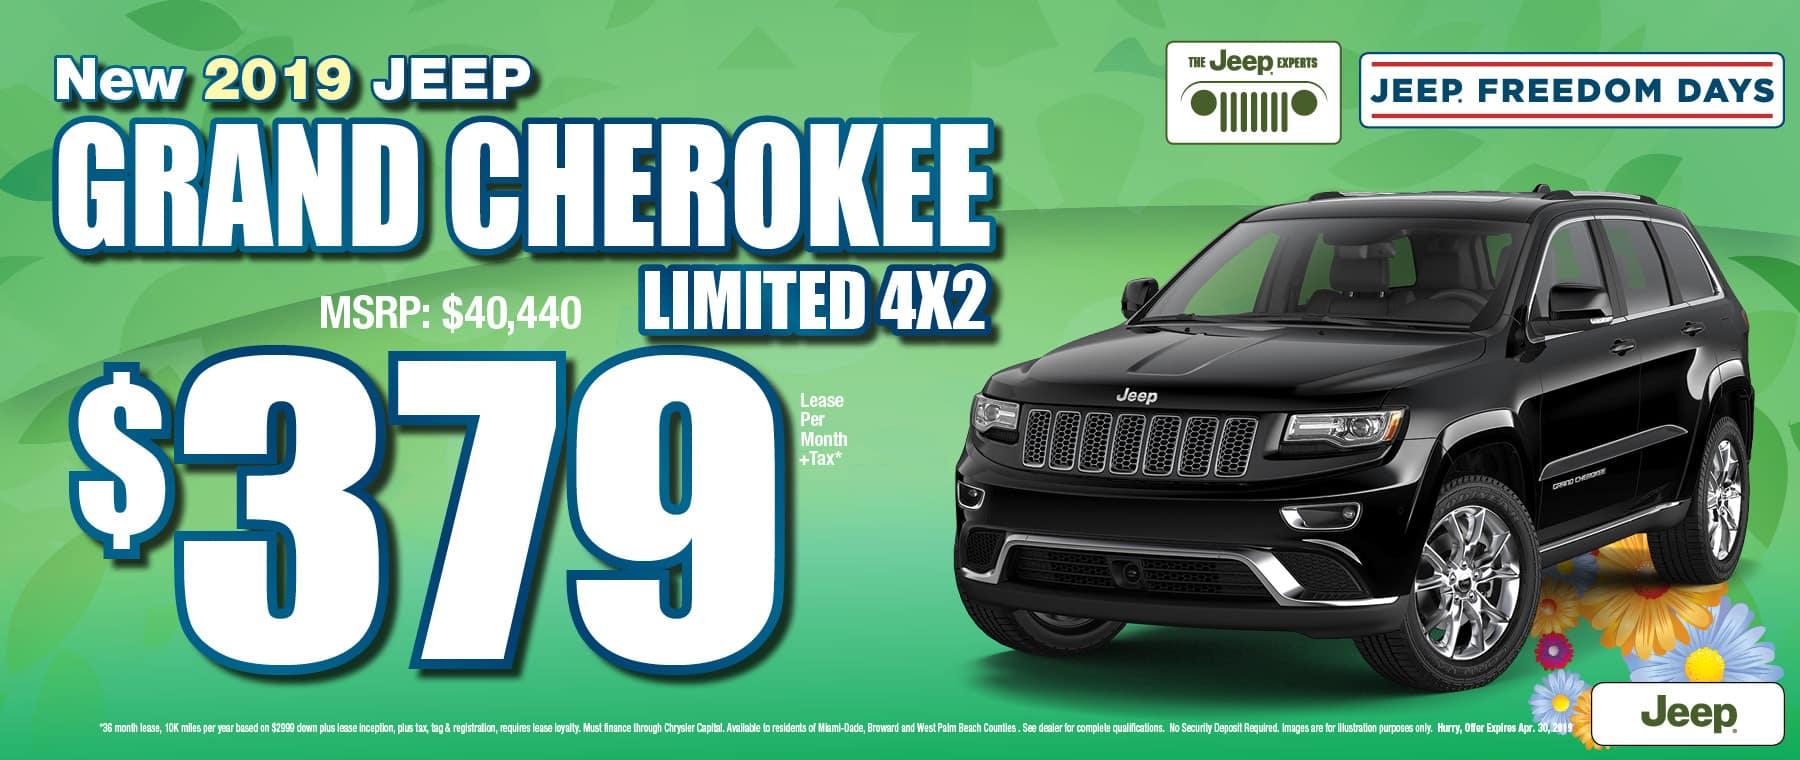 Grand Cherokee $379 Lease